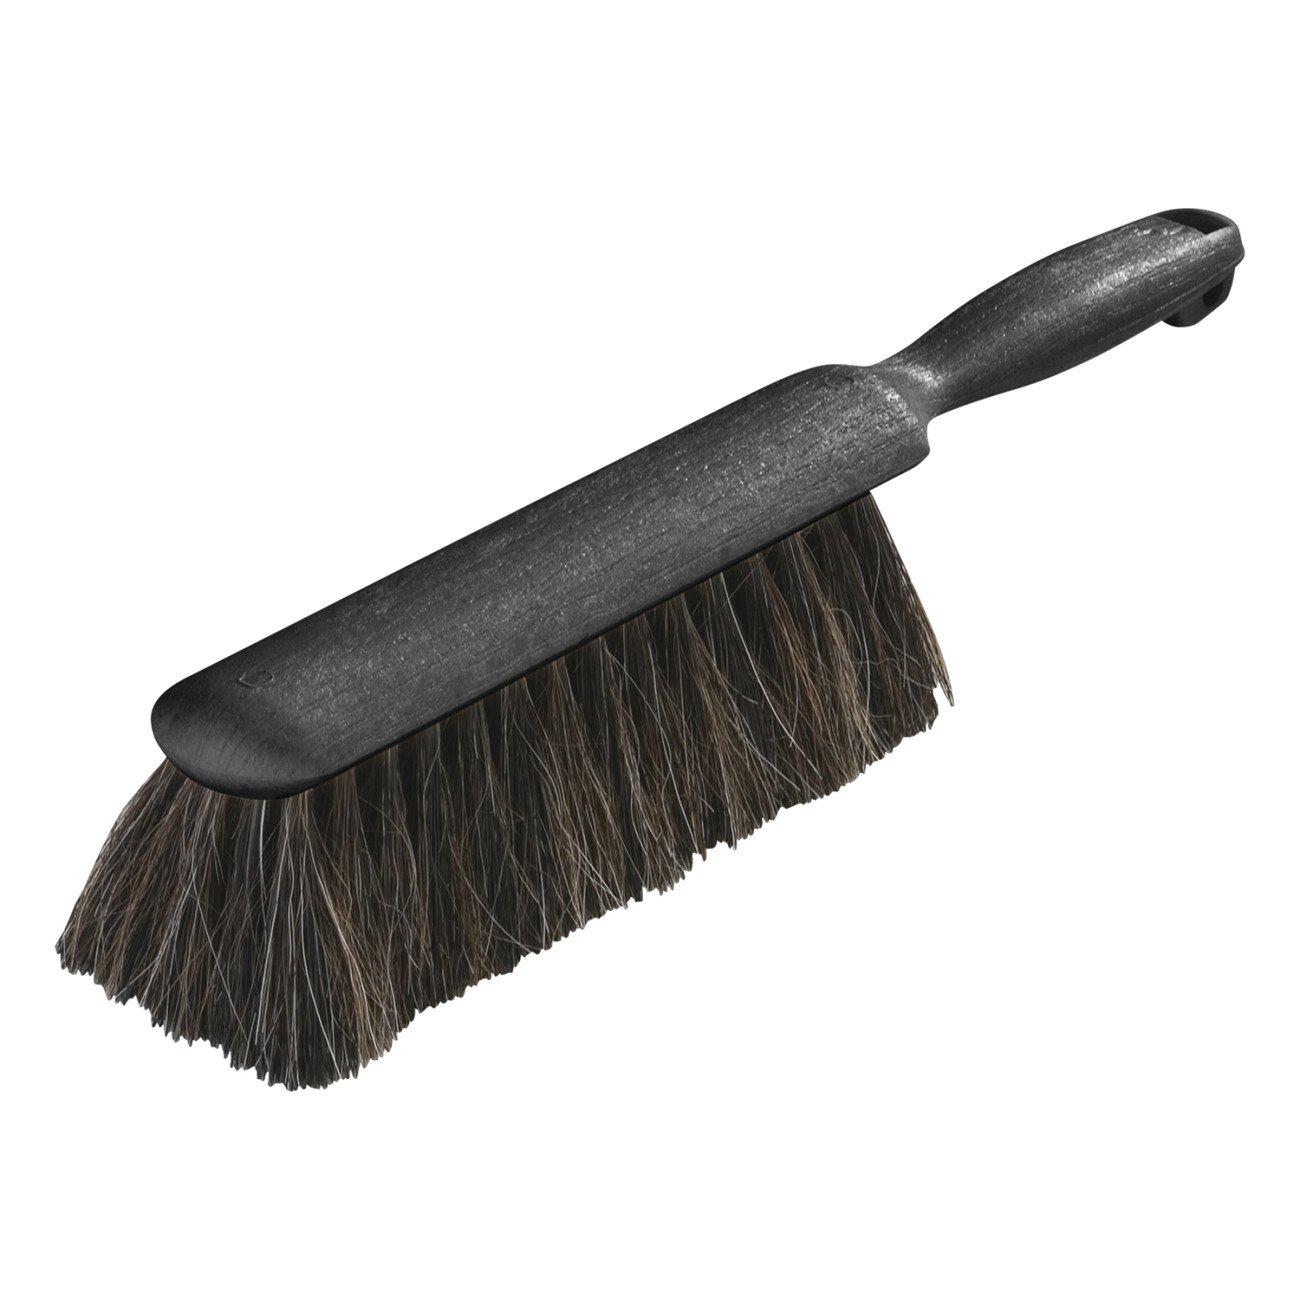 Carlisle 3622503 Flo-Pac Plastic Handle Counter Brush, Horsehair Blend Bristles, 2-1/2' Bristle Trim, 8' Length, Black 2-1/2 Bristle Trim 8 Length Carlisle Corporation